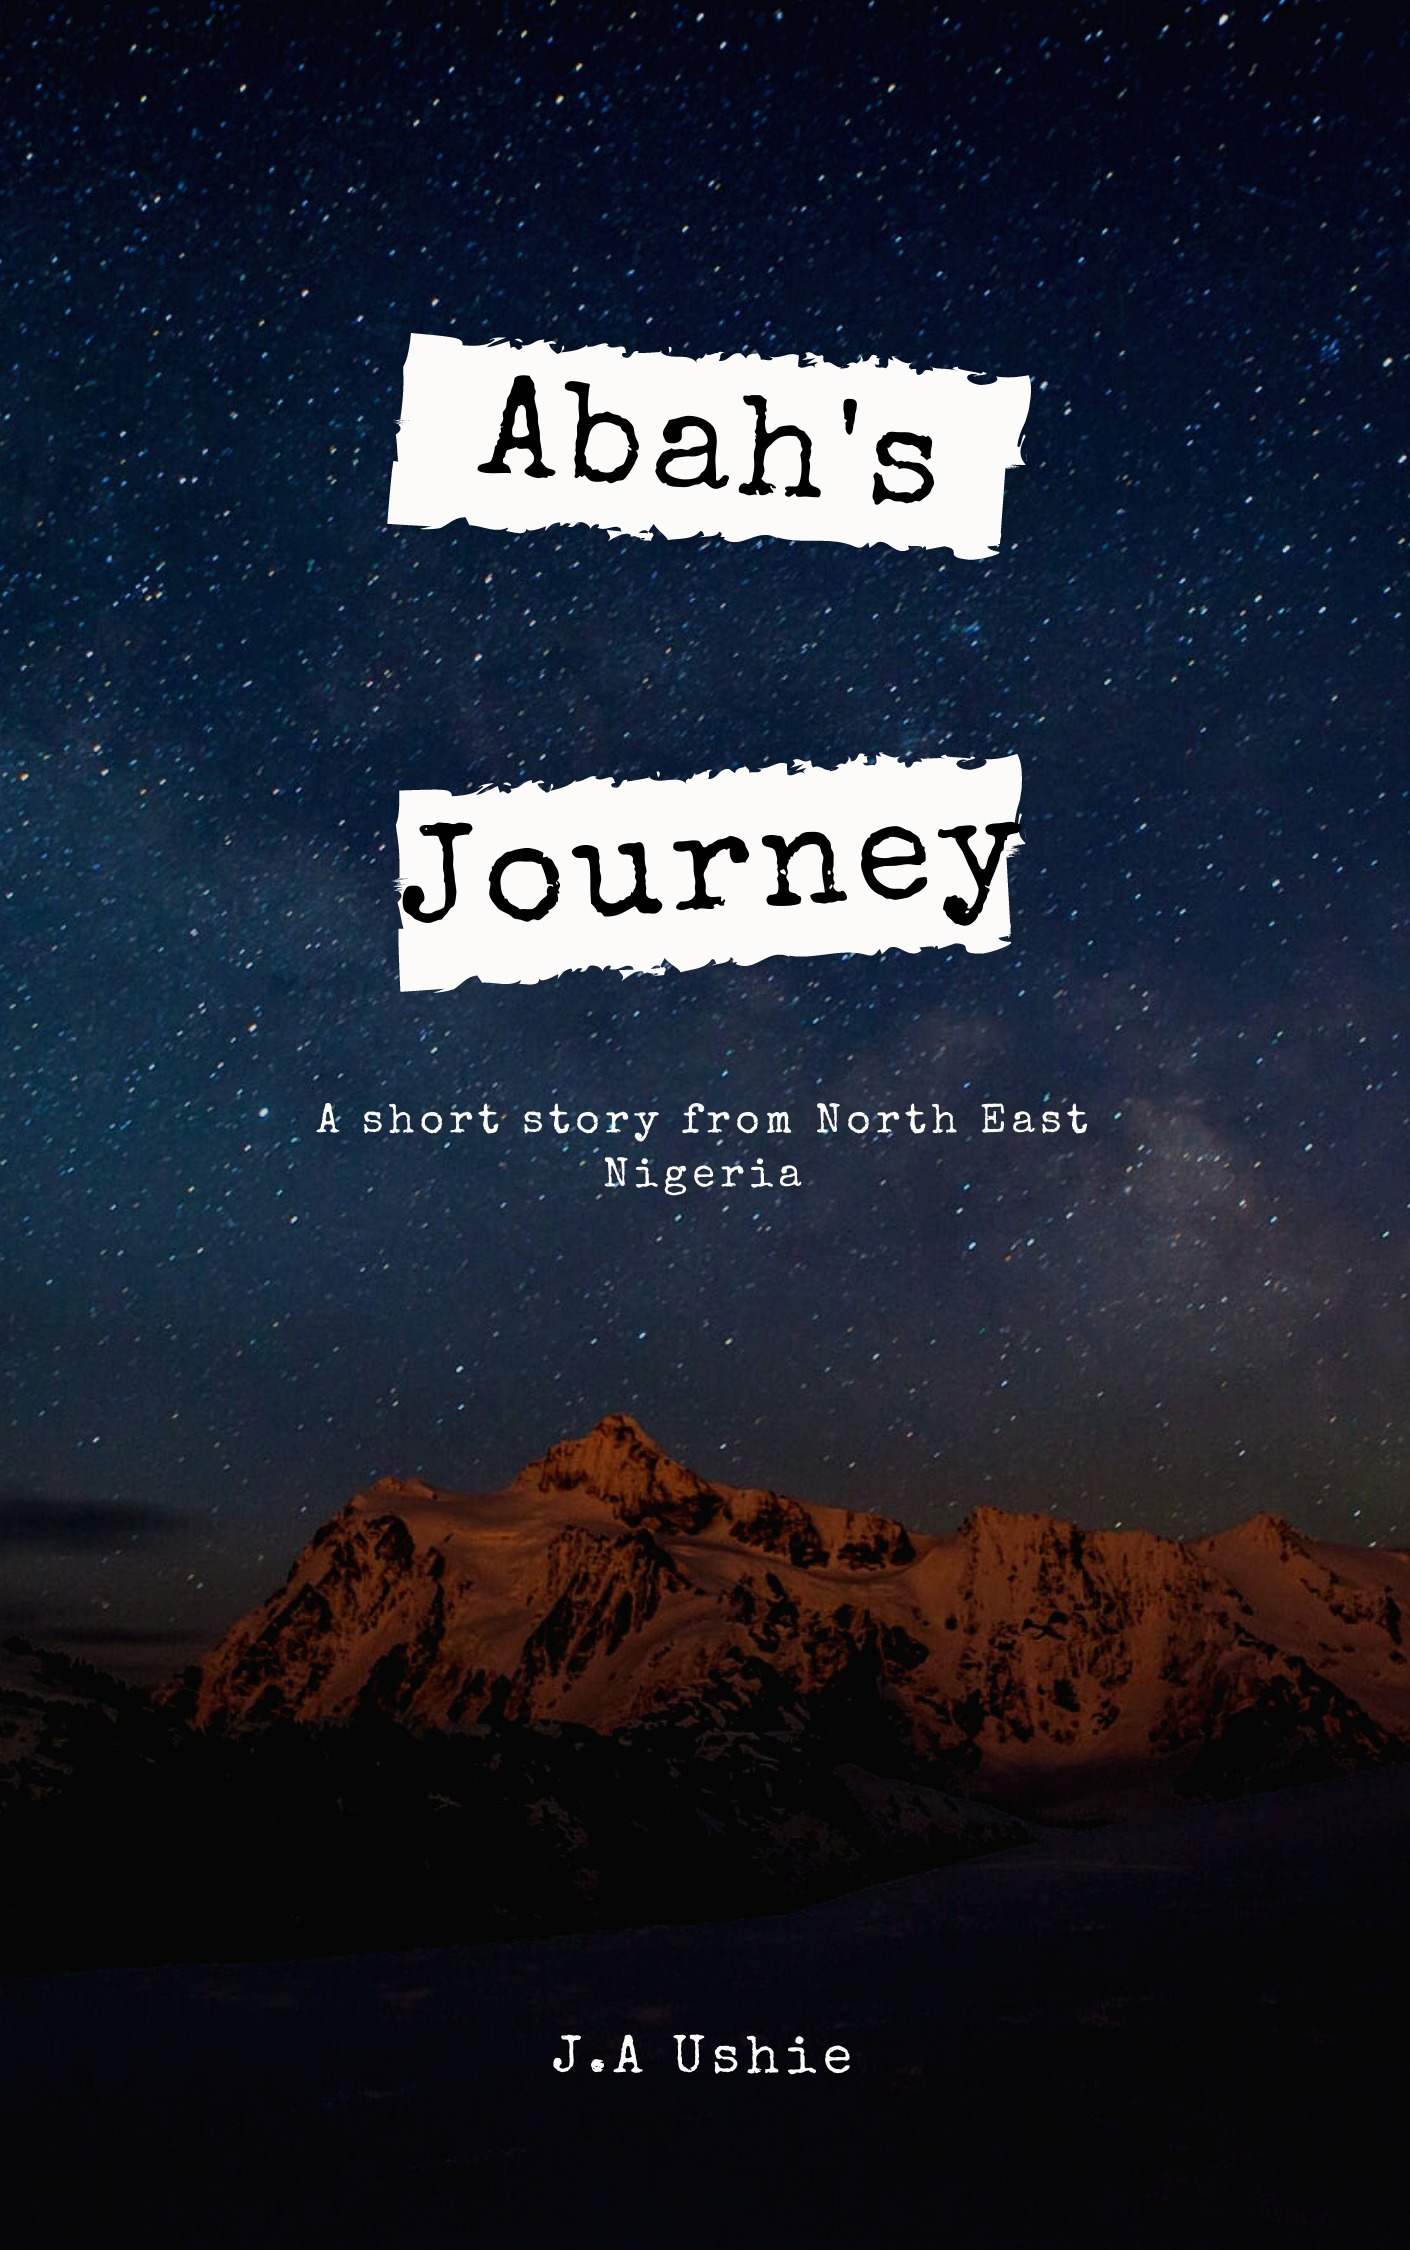 Abah's Journey